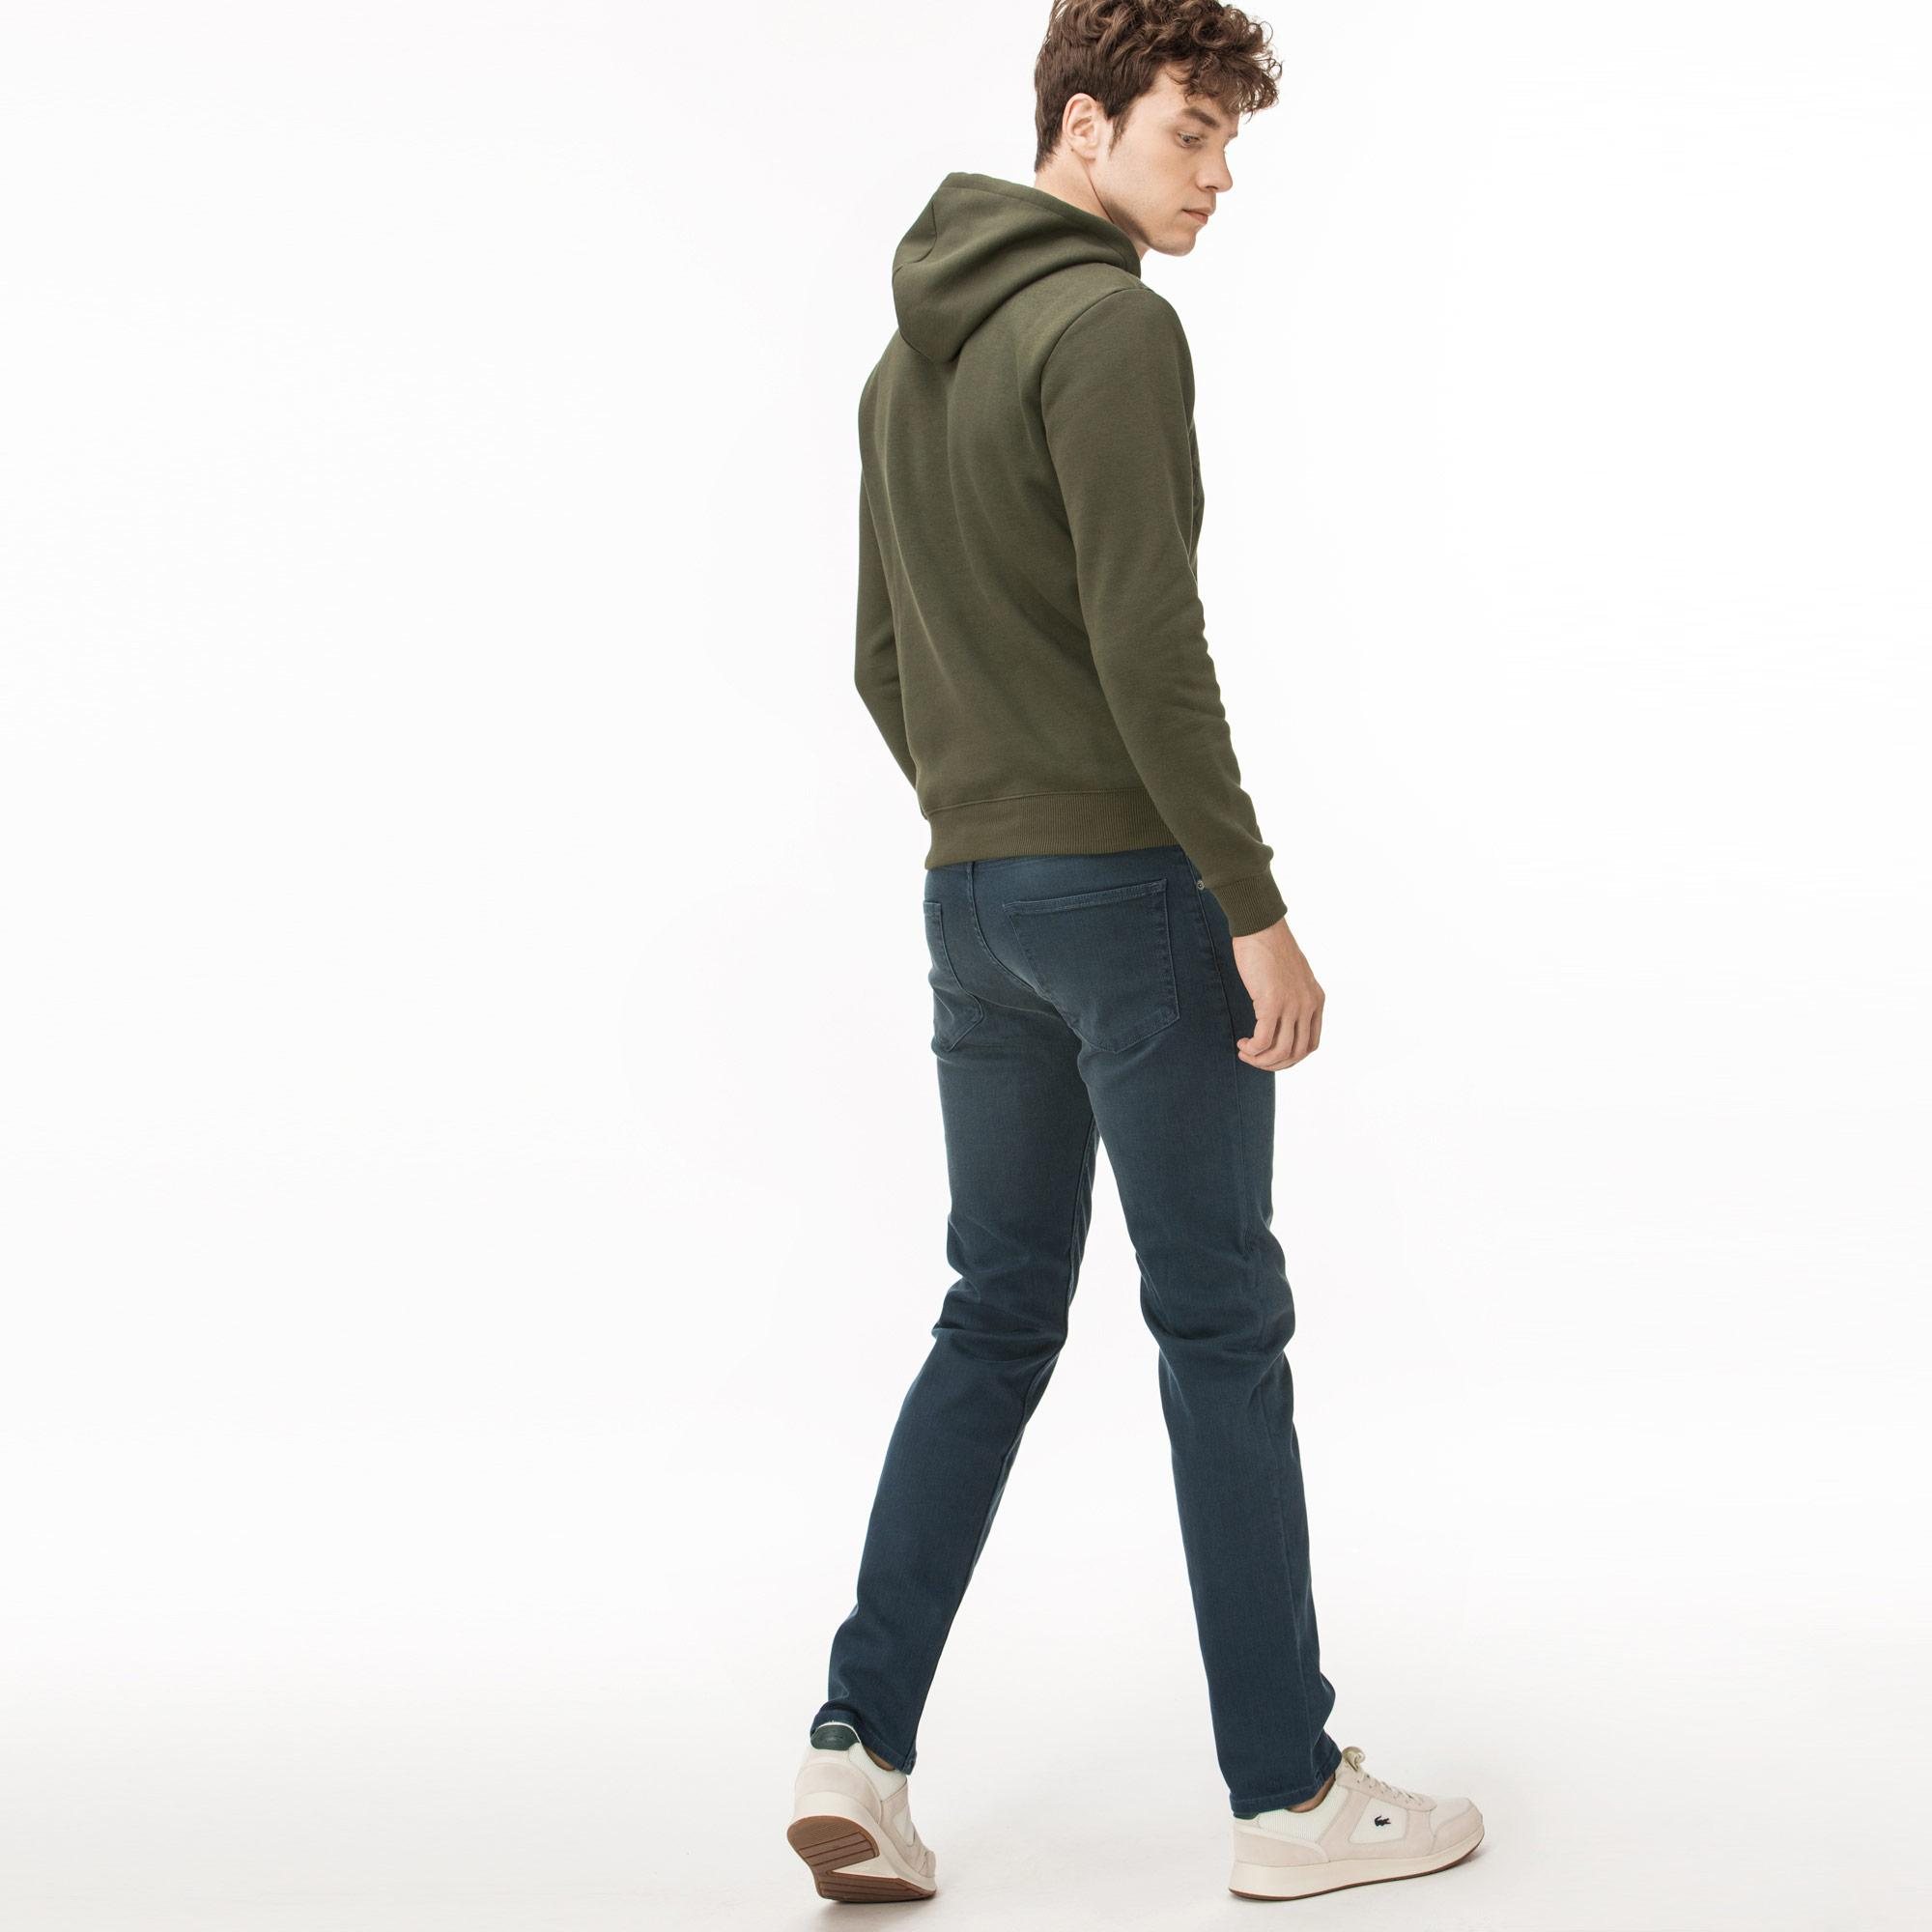 Lacoste Erkek Slim Fit Koton Antrasit Jean